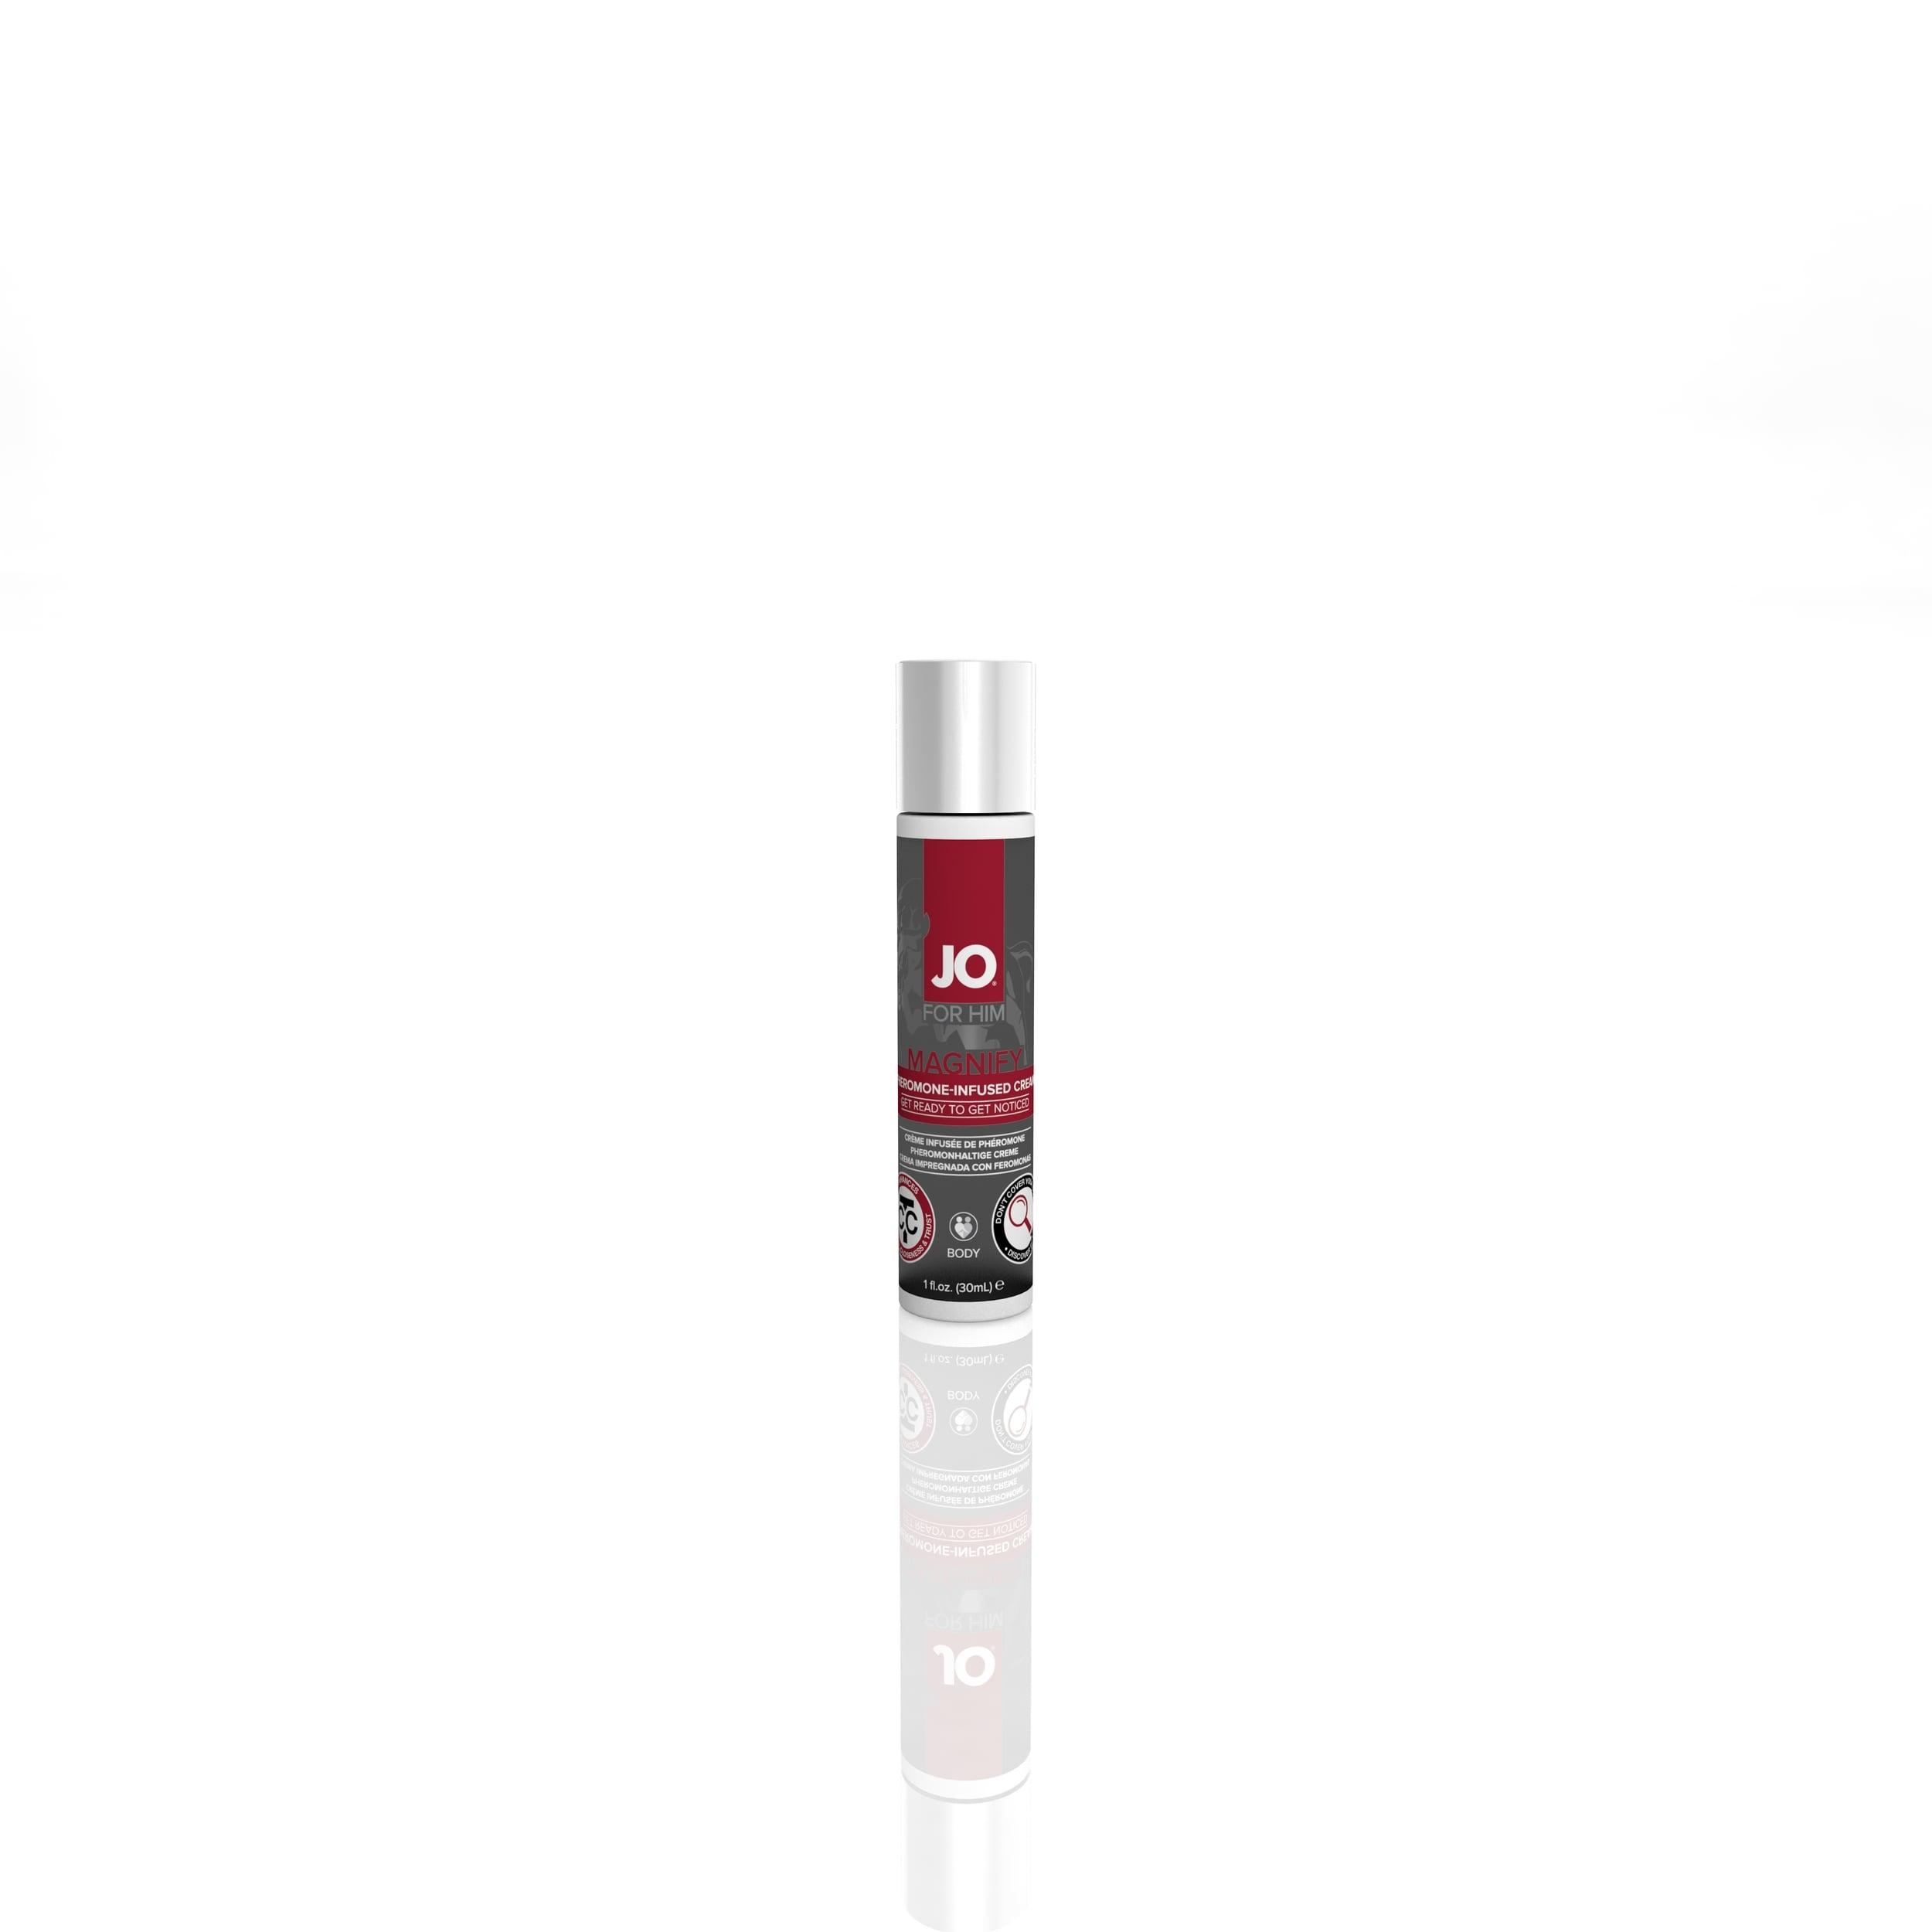 40187 - JO MAGNIFY - PHEROMONE INFUSED ATTRACTANT CREAM - FOR HIM - 1fl.oz30mL (bottle).jpg